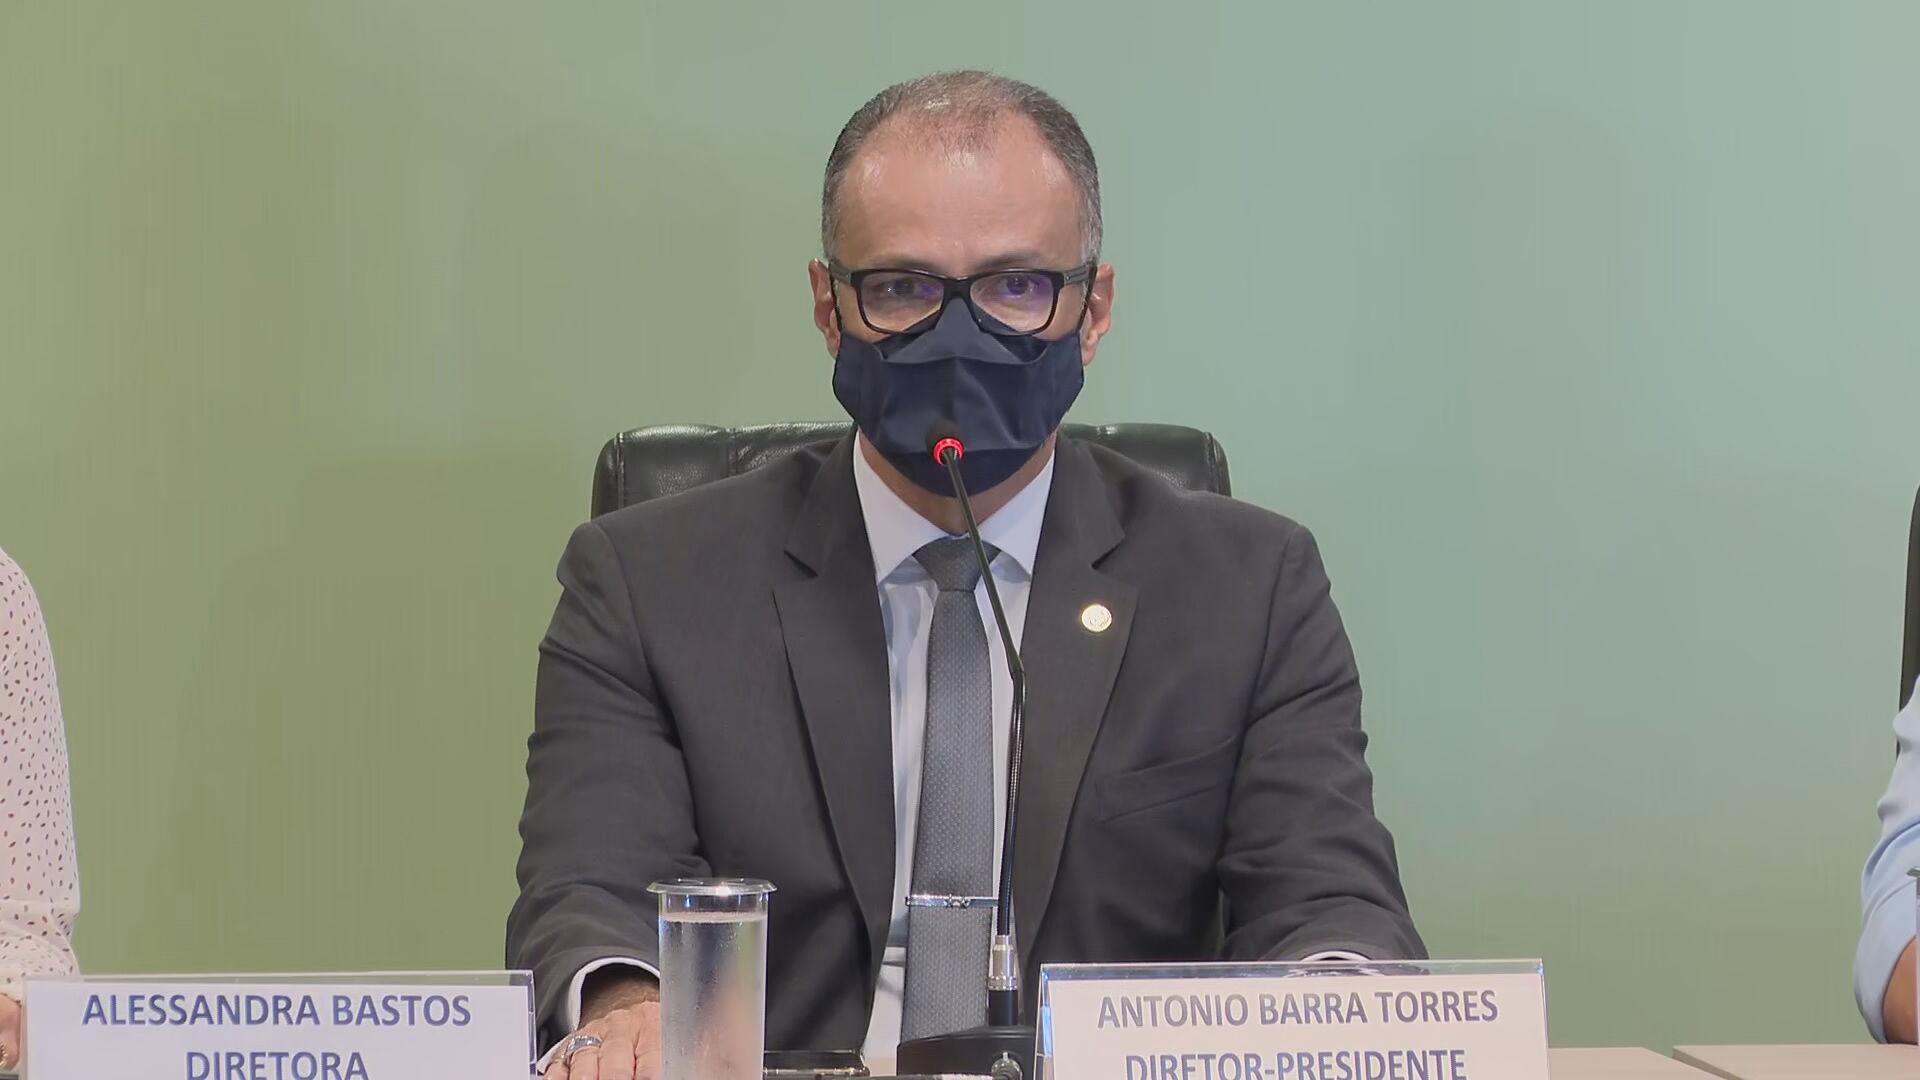 Antonio Barra Torres, diretor-presidente da Anvisa.